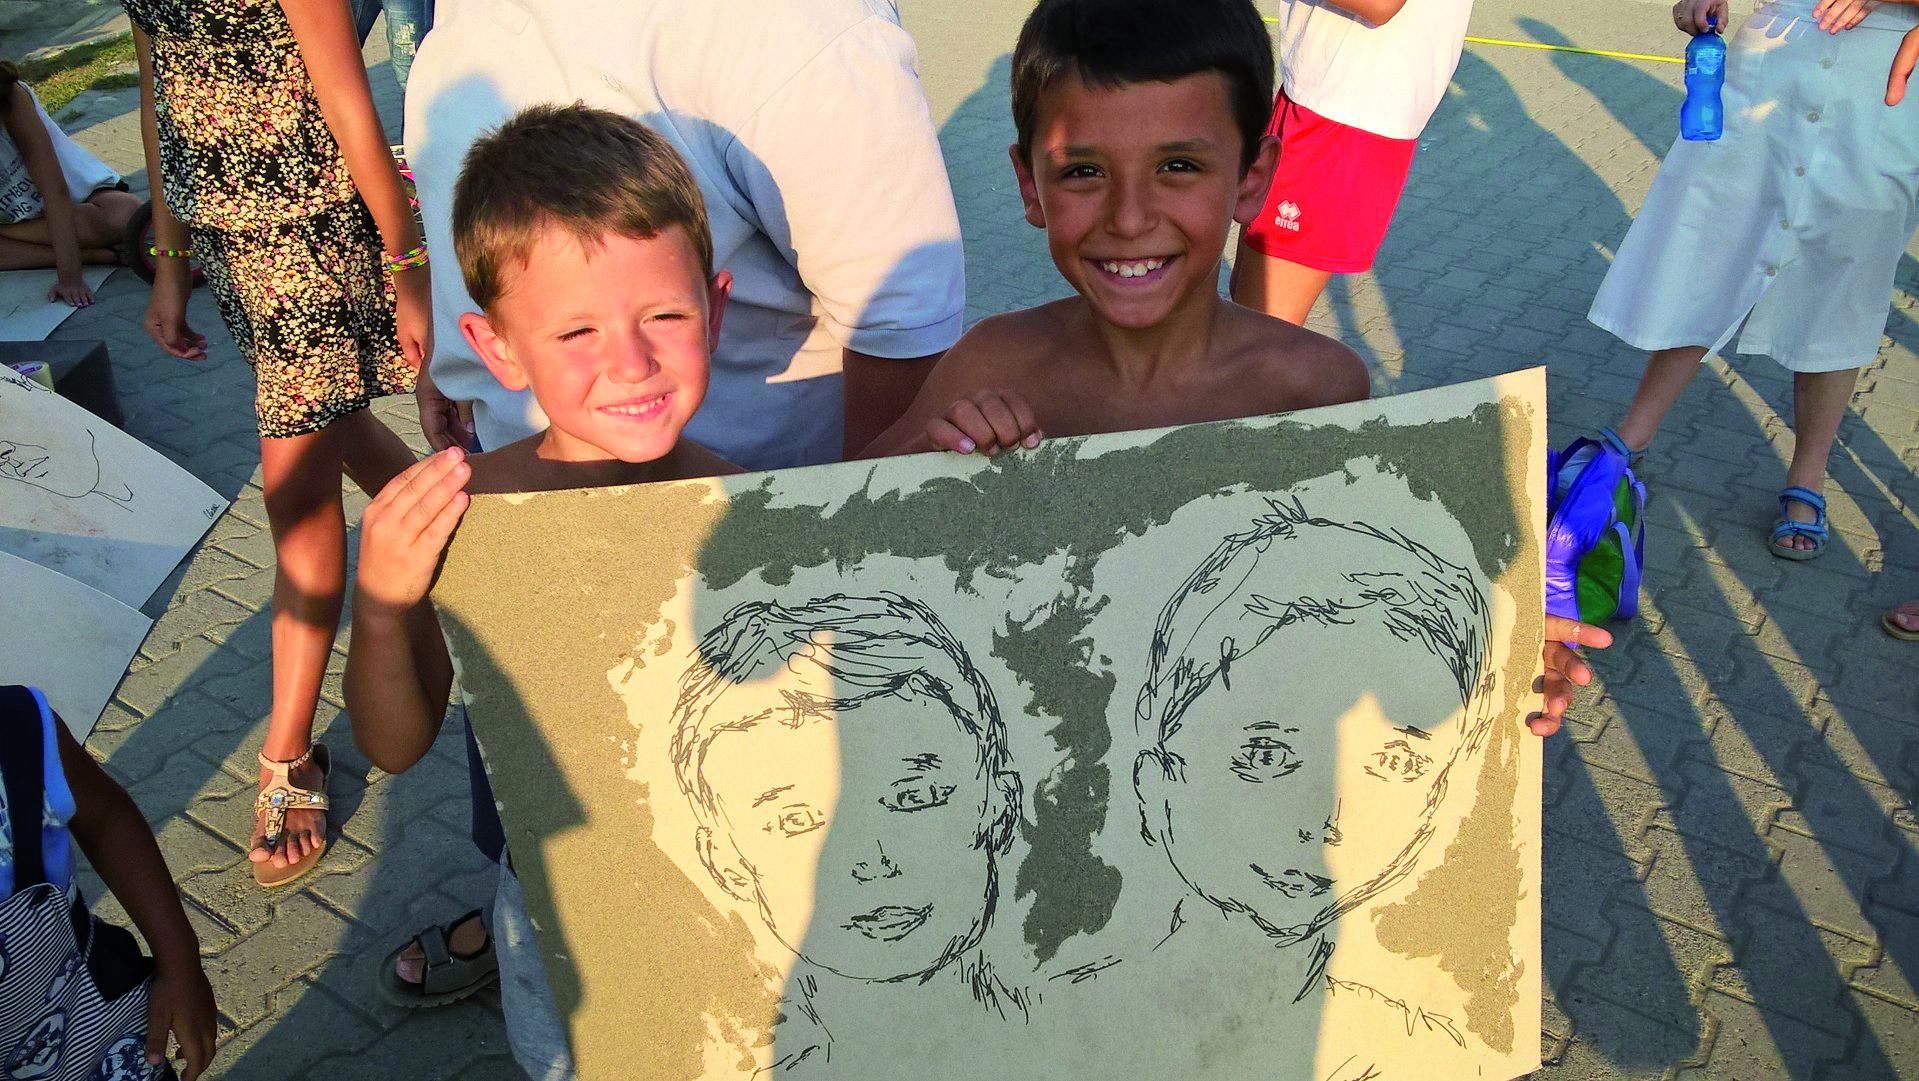 Bambini con un disegno